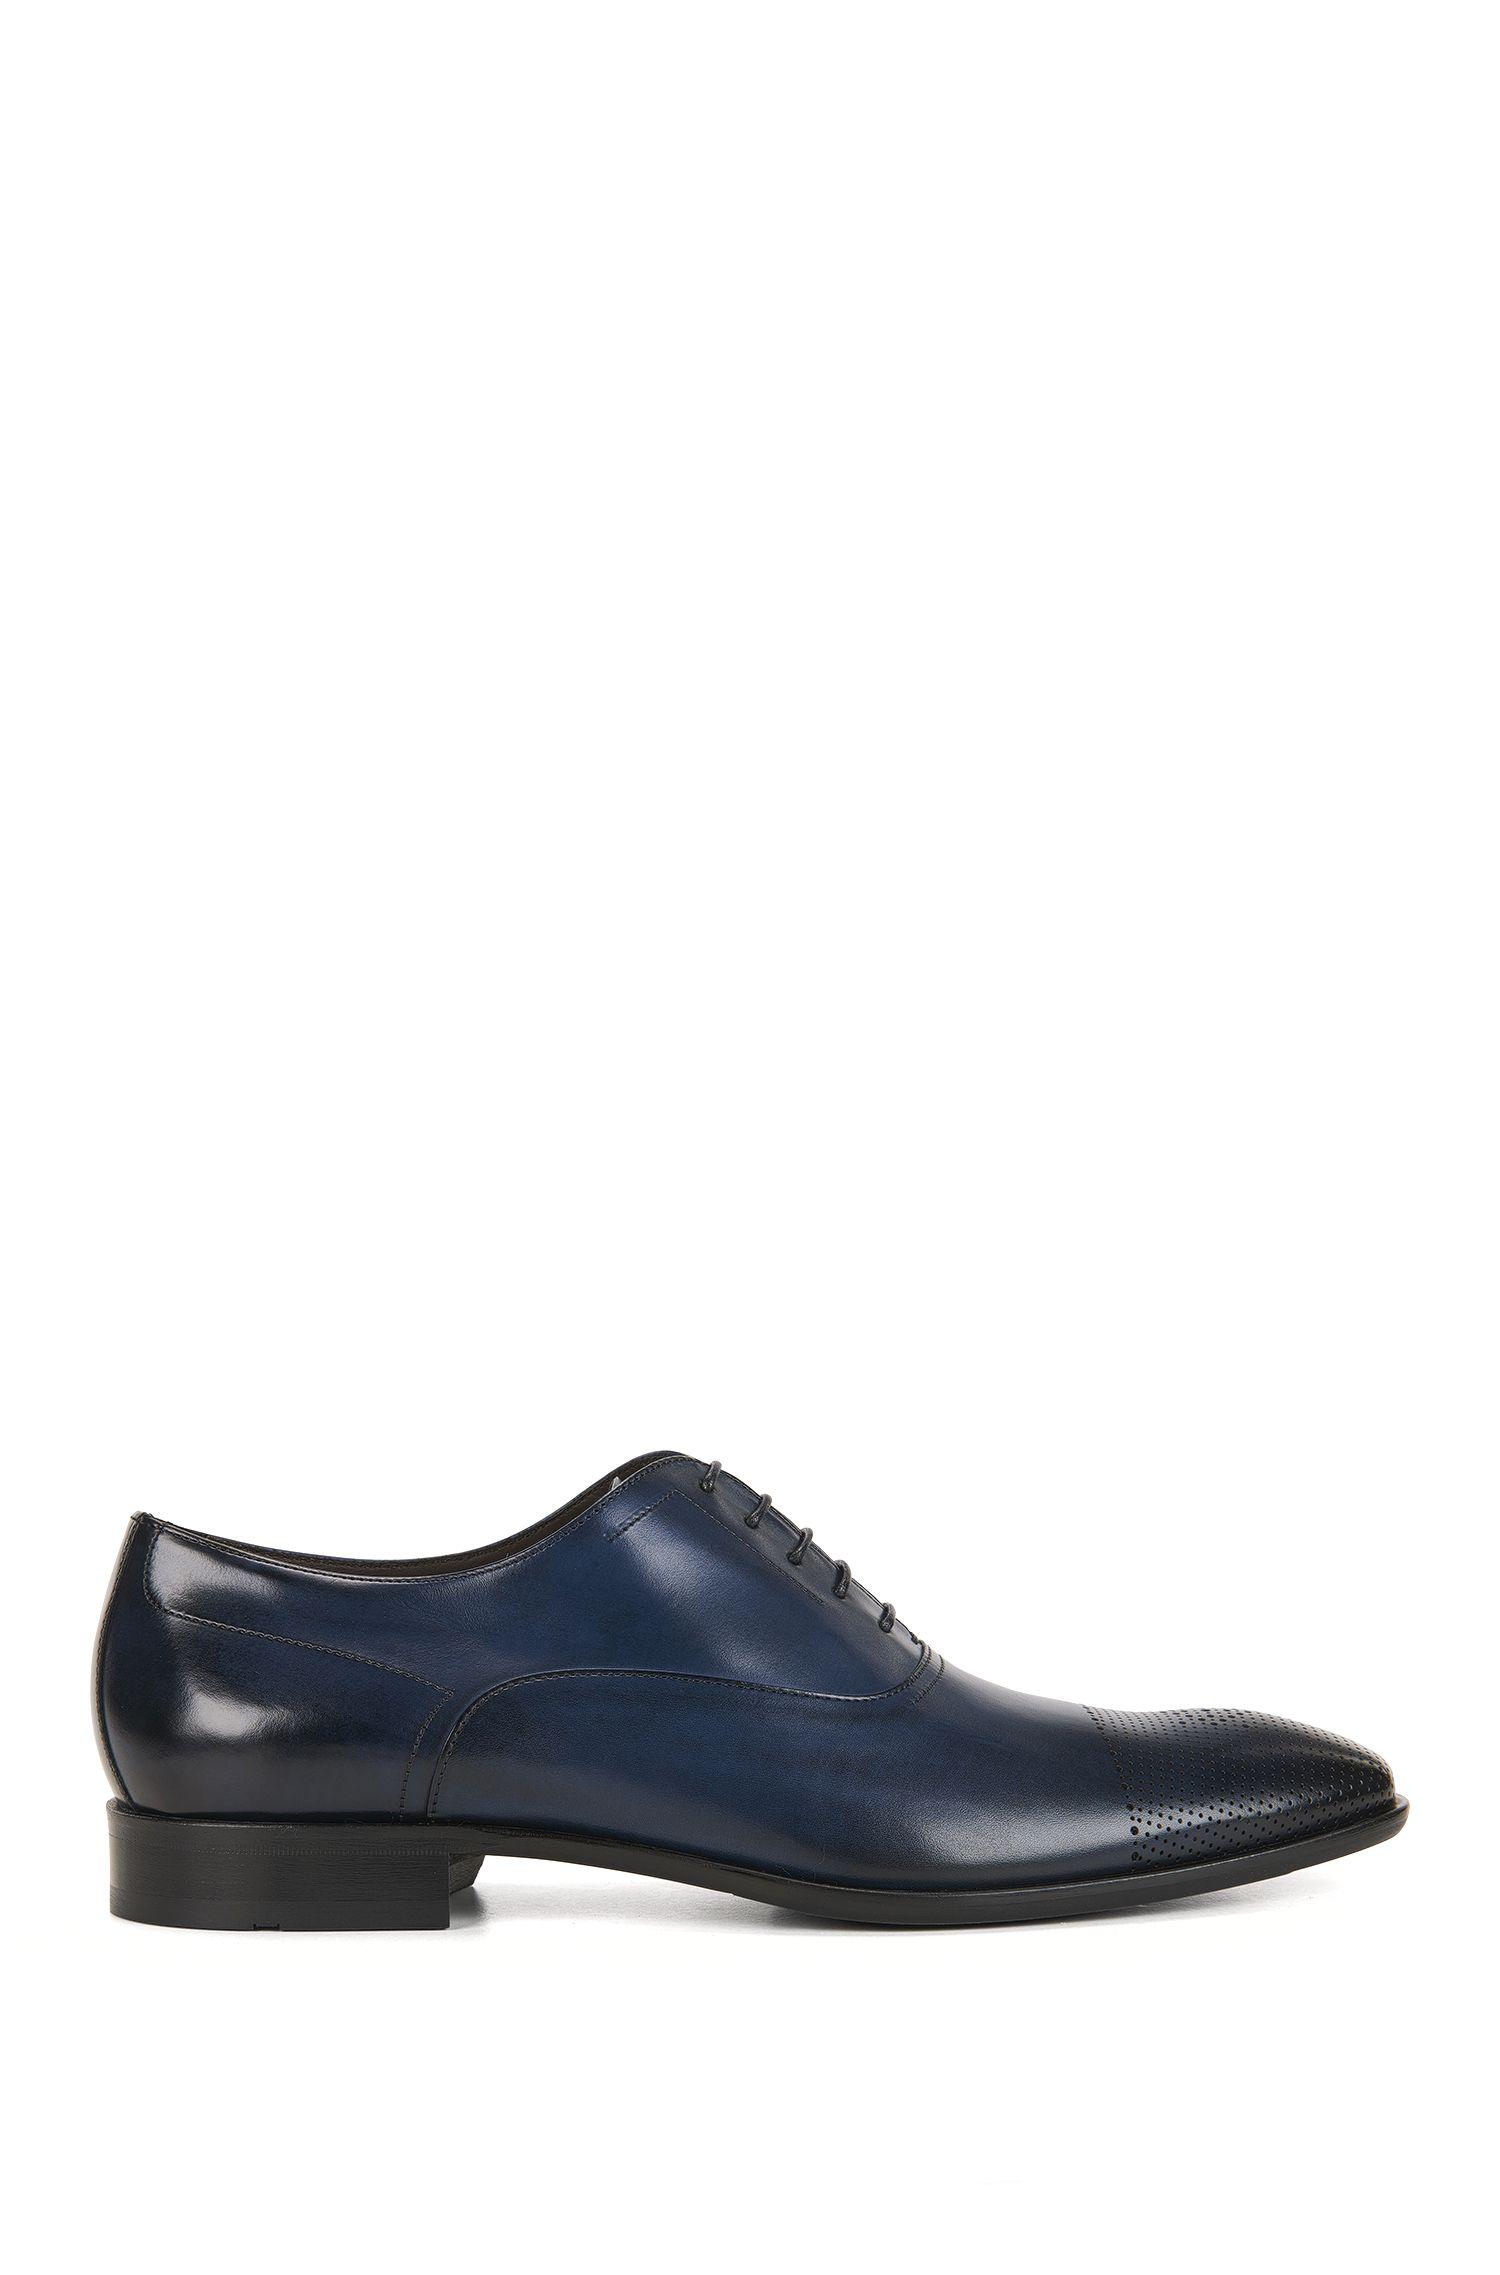 Zapatos Oxford de piel con puntera cortada a láser